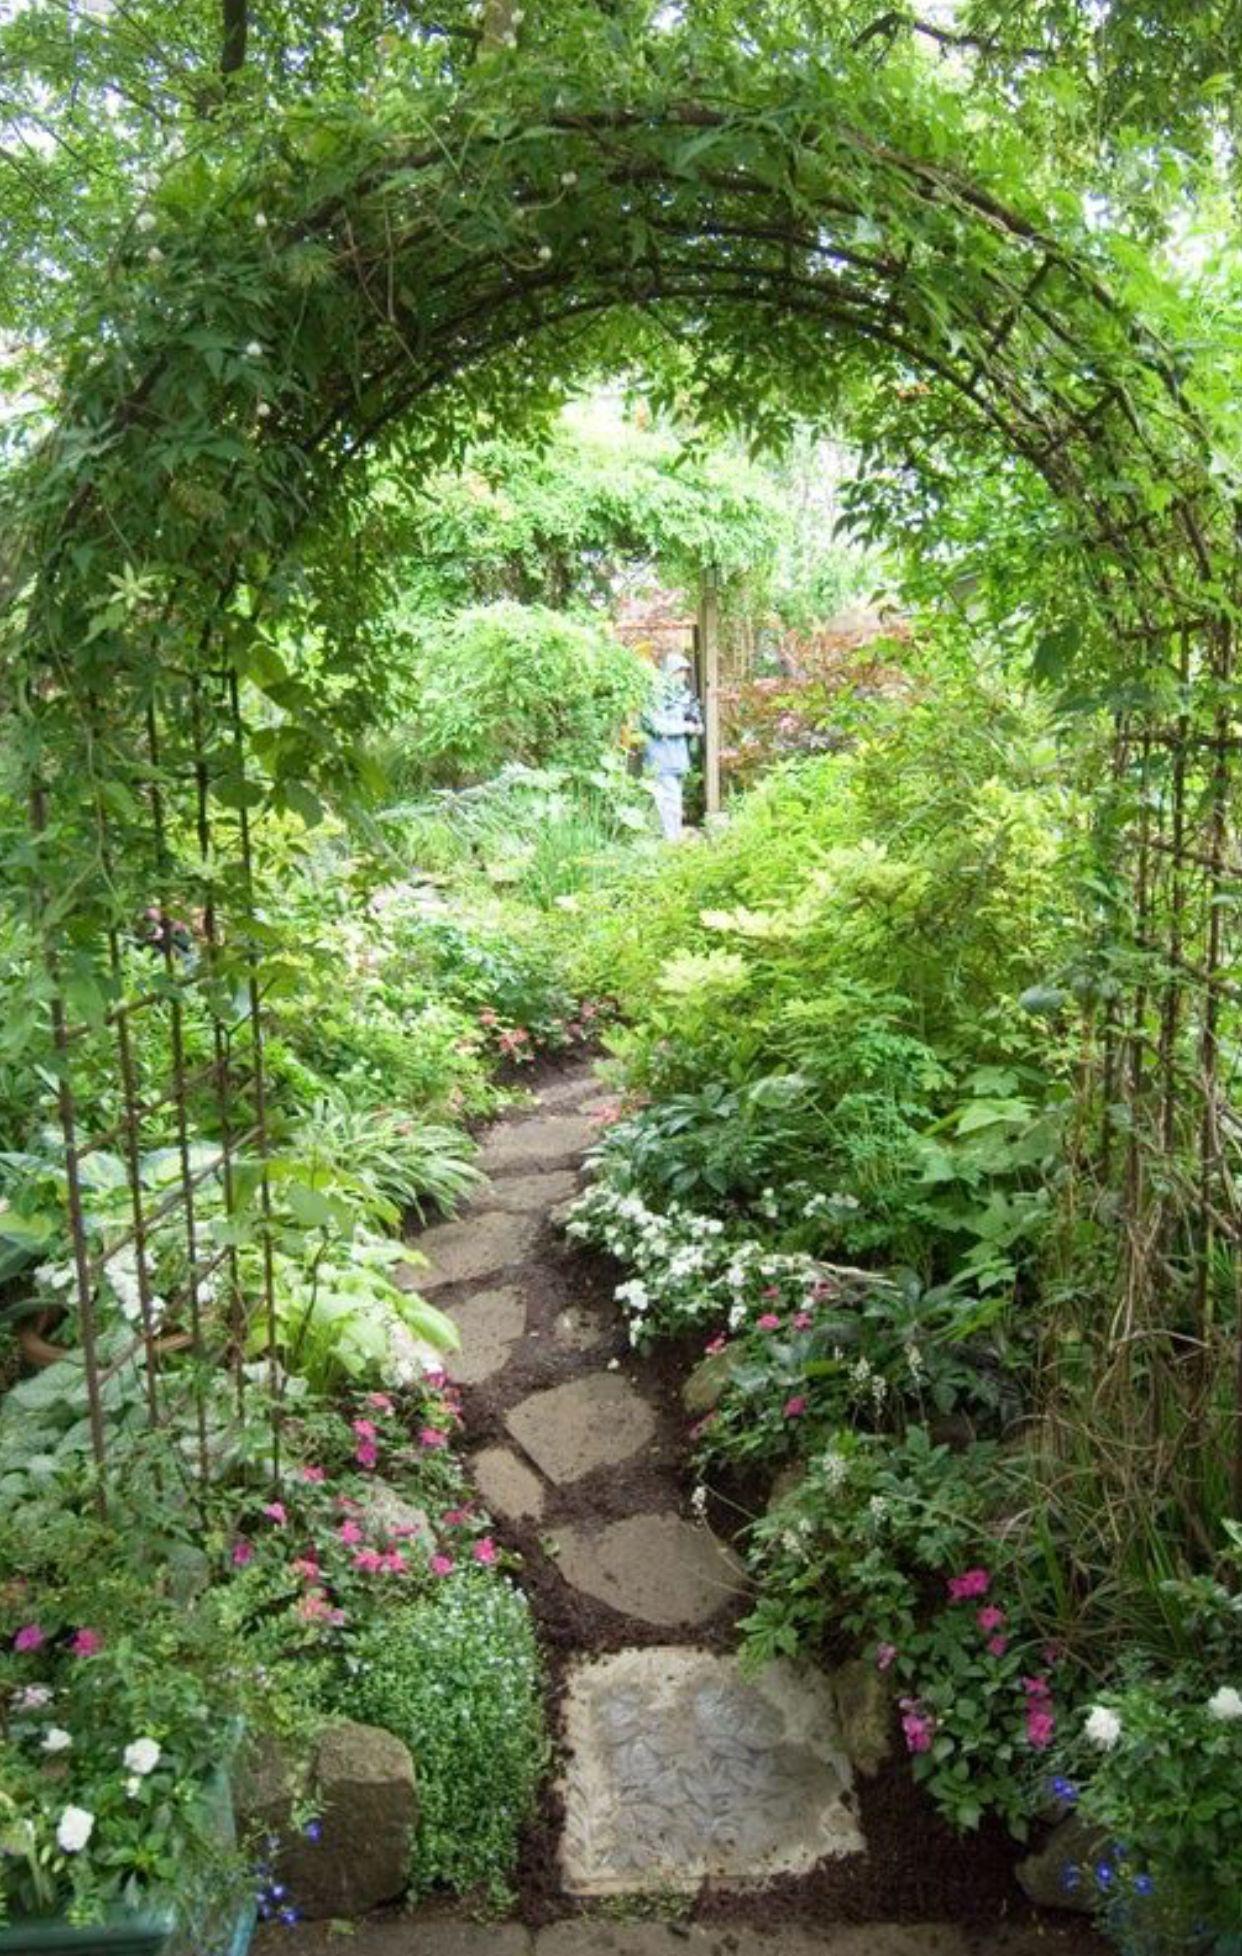 Pin By Kailey Walter On My Magical Botanical Garden Pinterest - Arcos-de-jardin